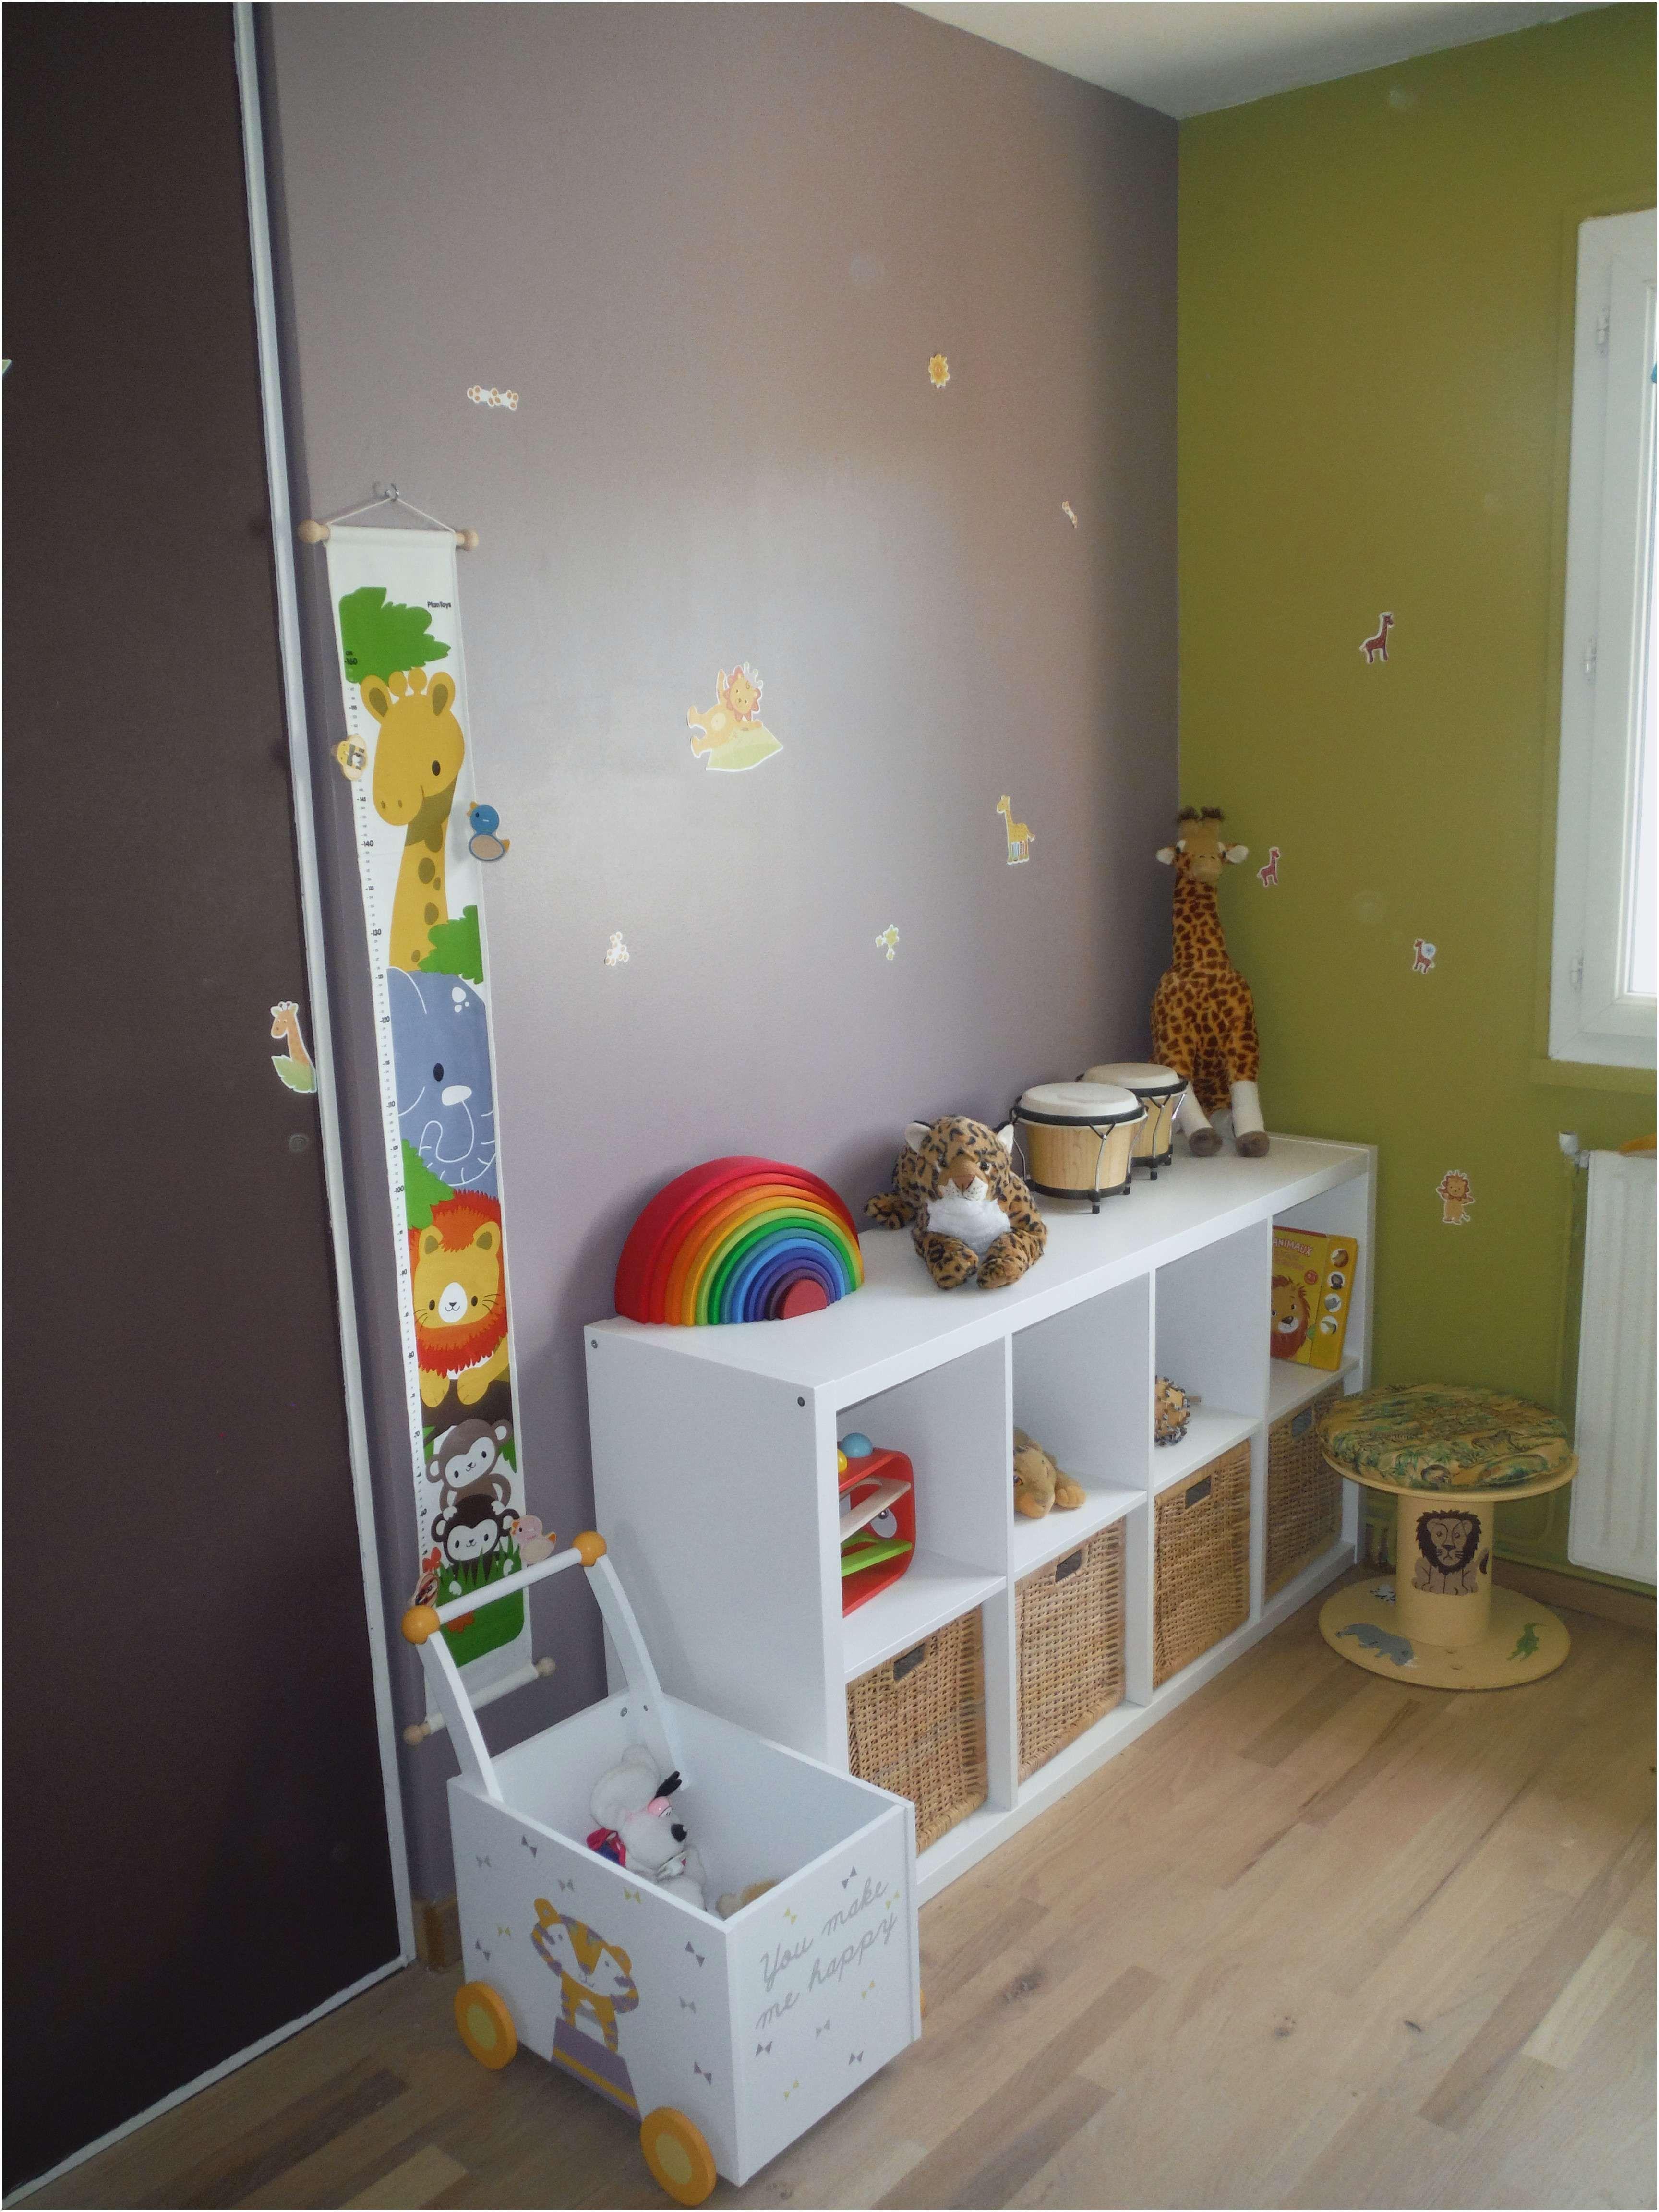 meuble rangement jouet enfant meuble rangement jouet conforama frais meuble de rangement jo chambre bebe decoration murale chambre bebe chambre bebe montessori